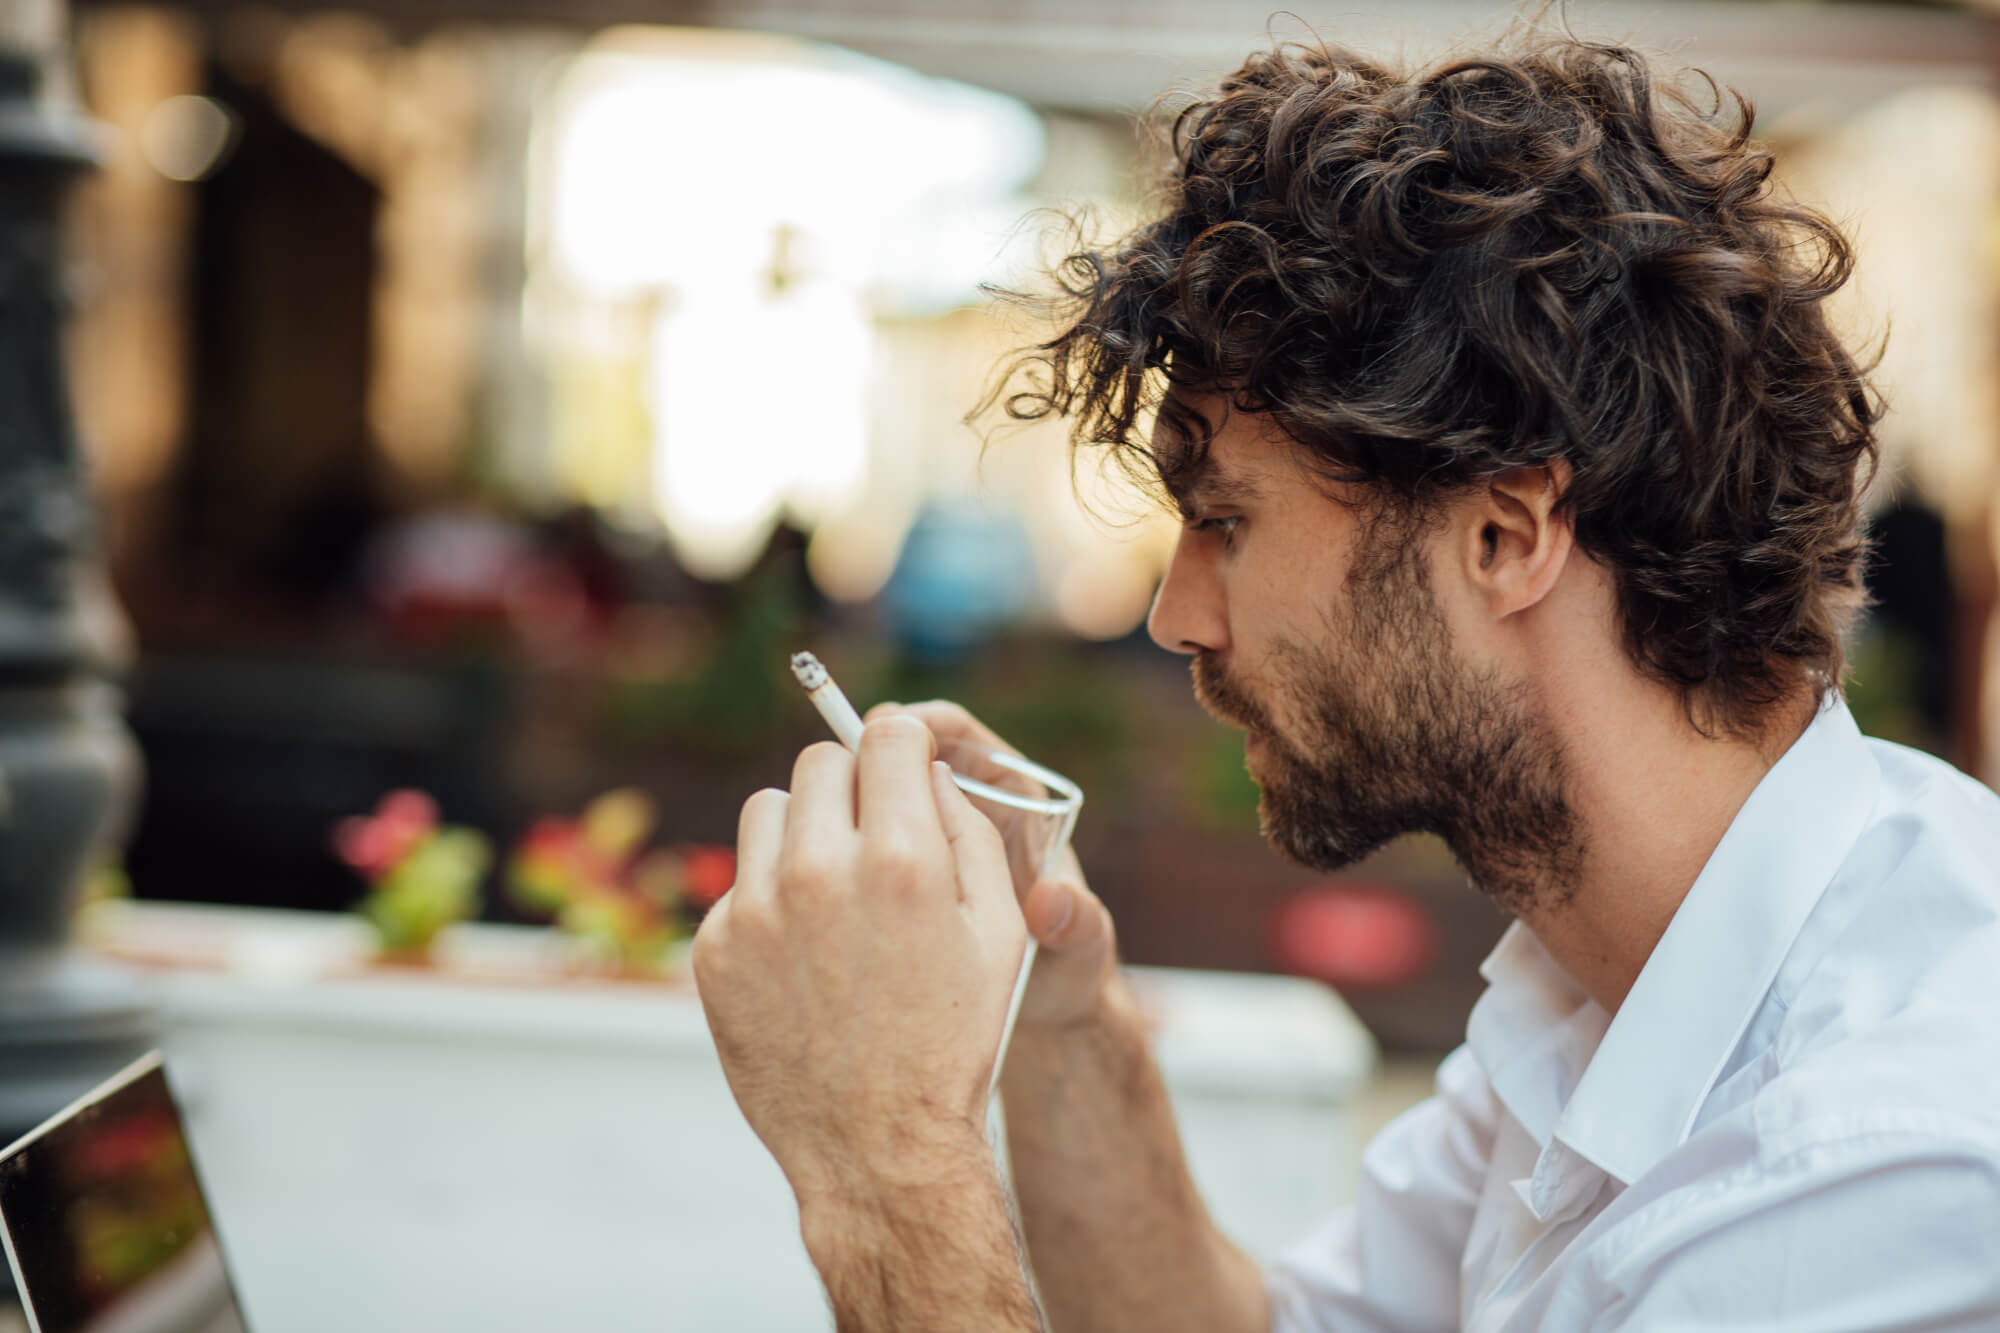 bad habits according to an Endodontist in Midlothian VA